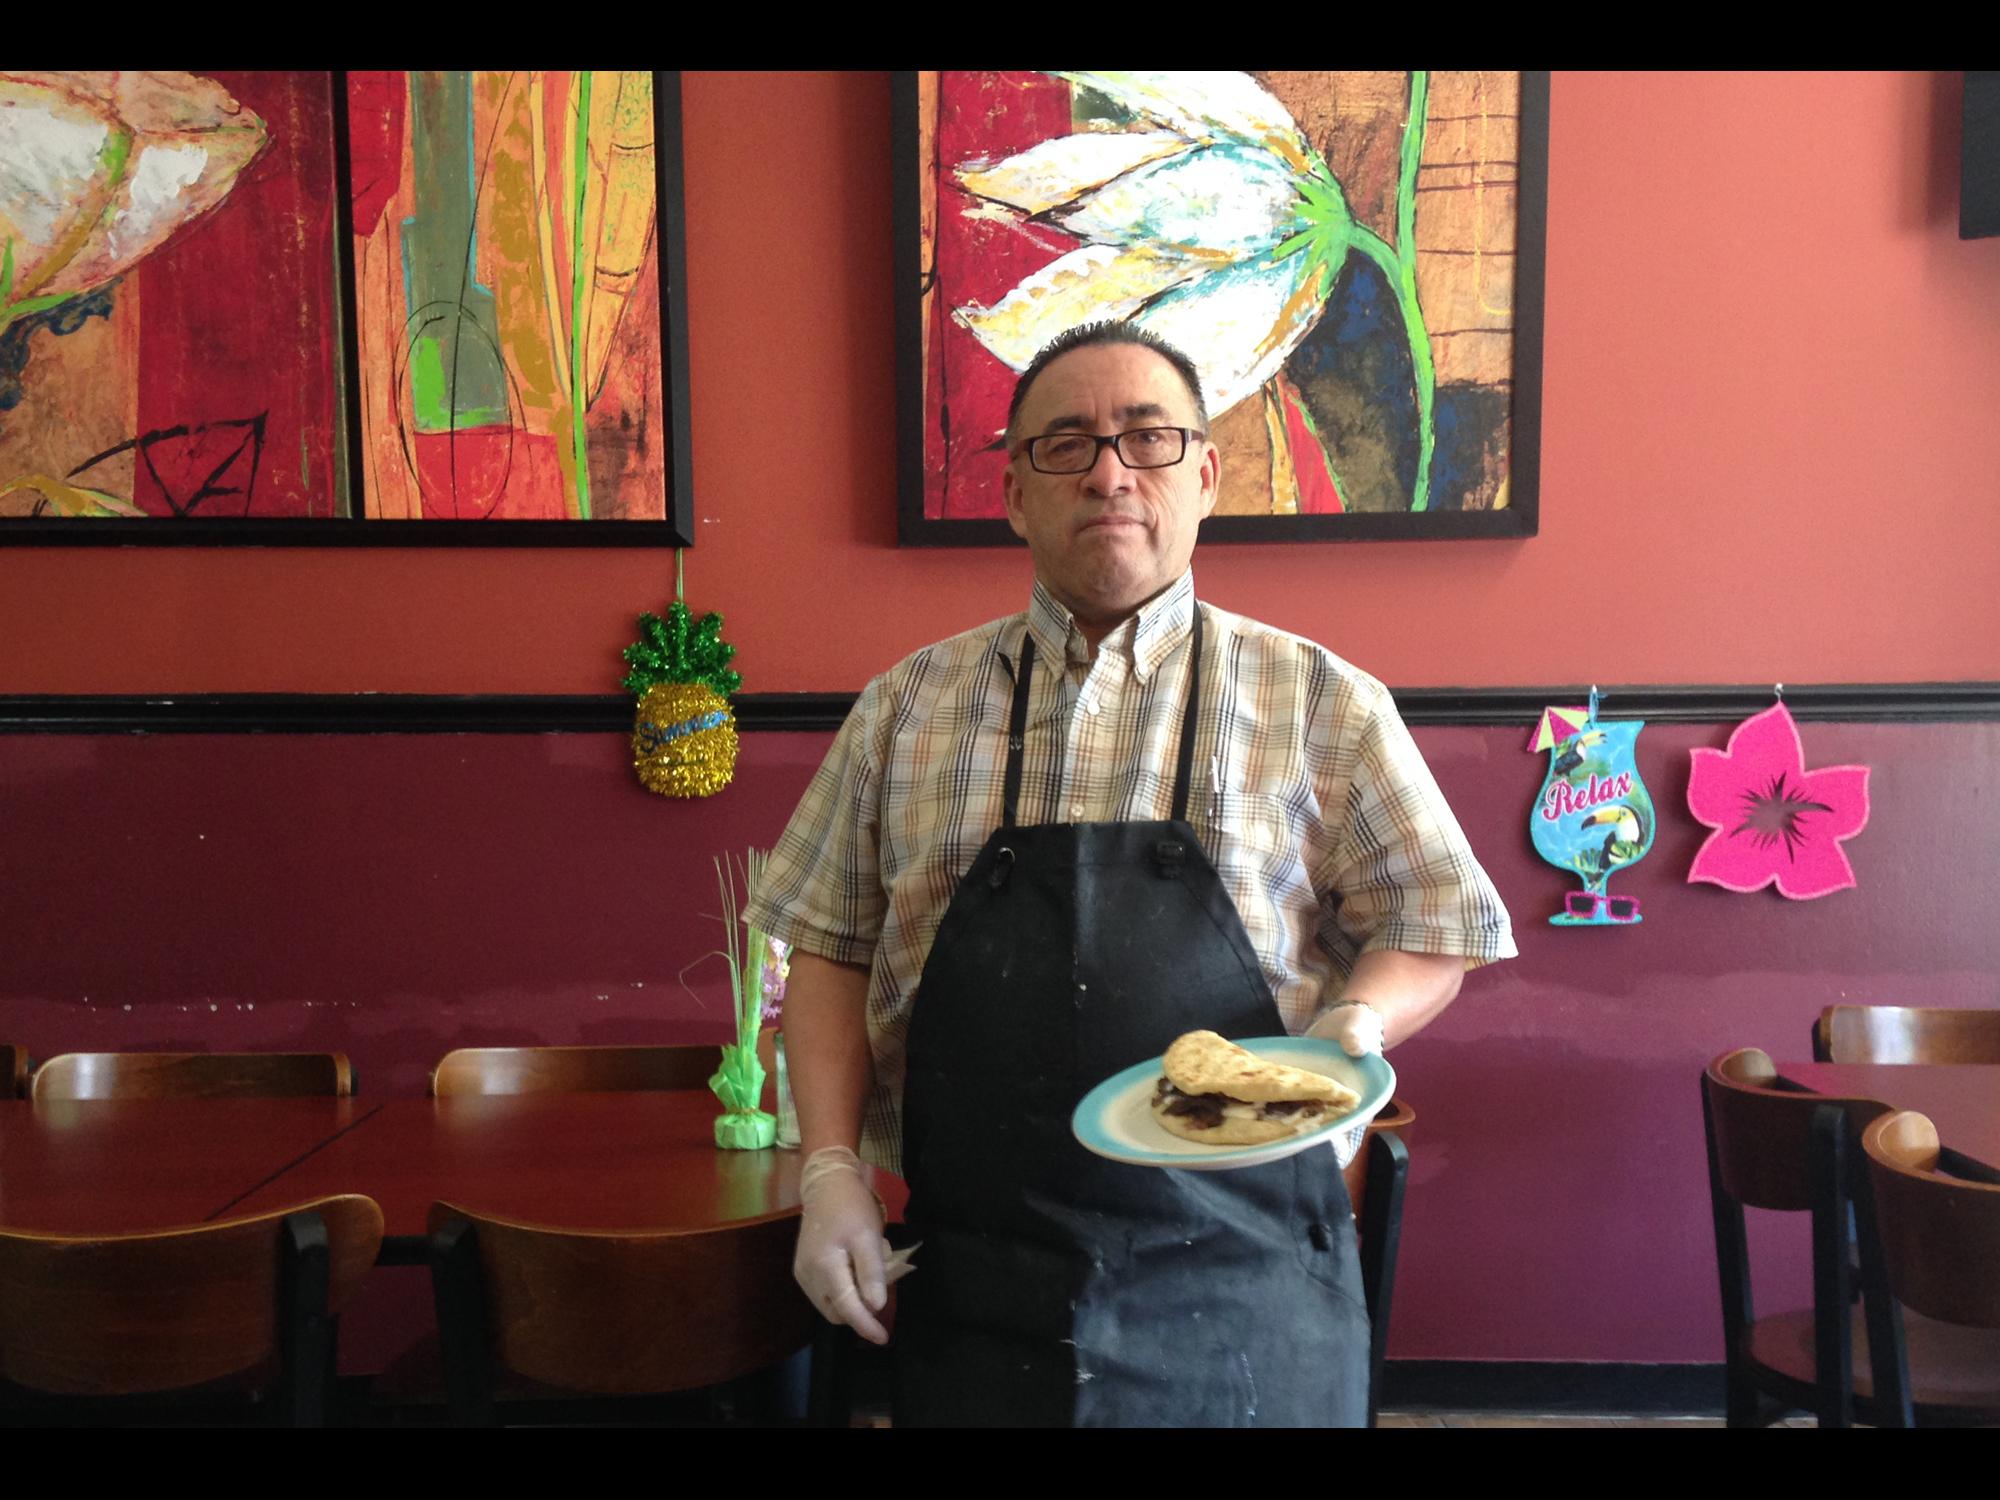 MEET THE BALEADA KING OF CHICAGO, AT CAFE IZALCO